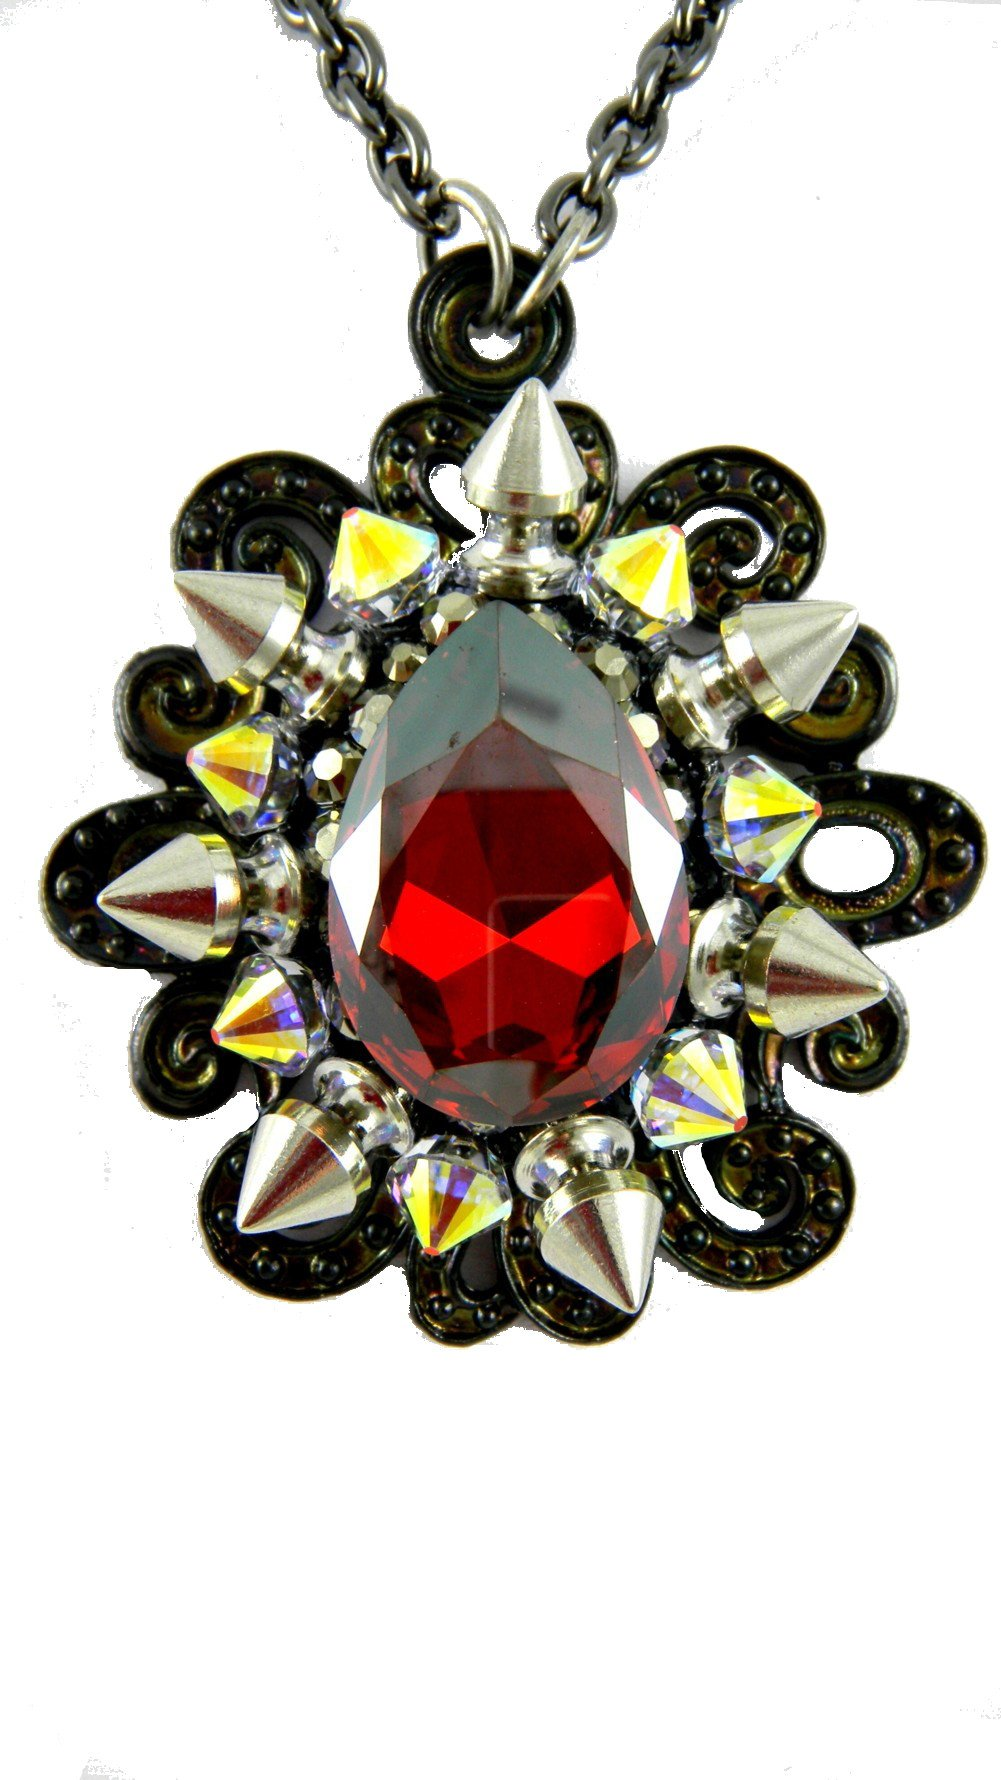 Rocker Jewelry Red Magma warovski Crystal Drop Pendant Crystal Spikes Chain Length: 18 Inch